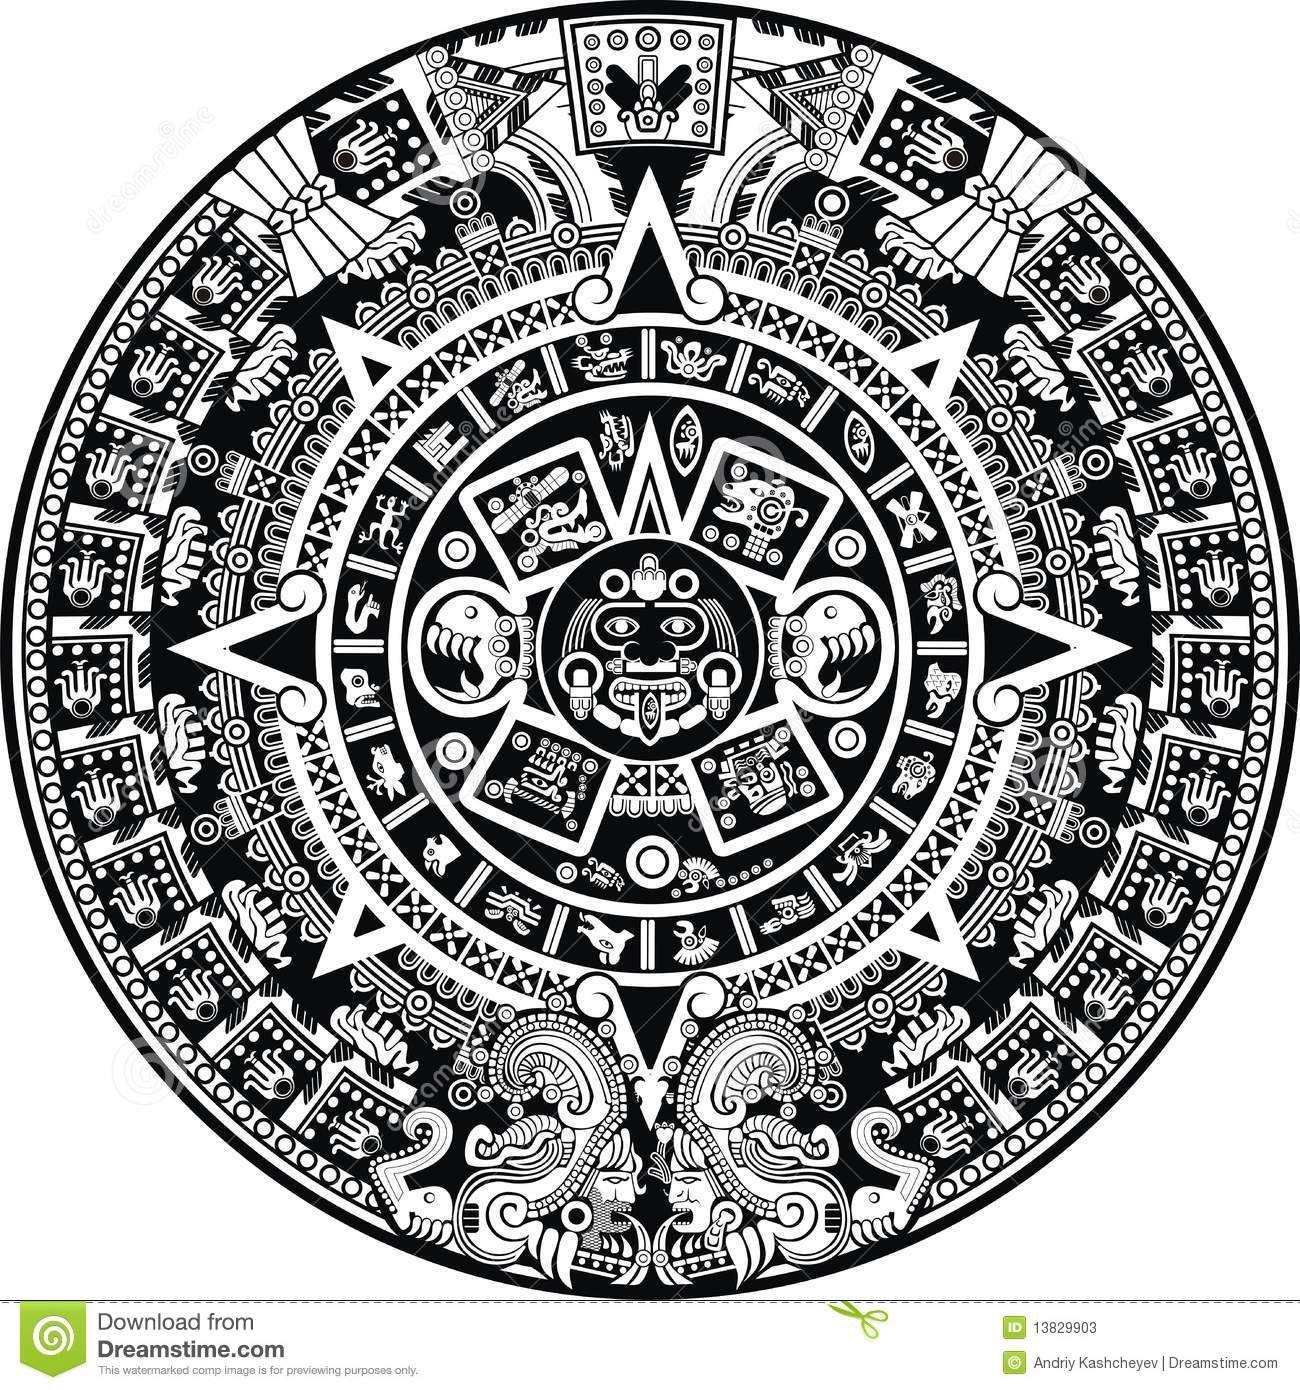 Mayakalender vektor abbildung. Illustration von mayakalender – 13829903